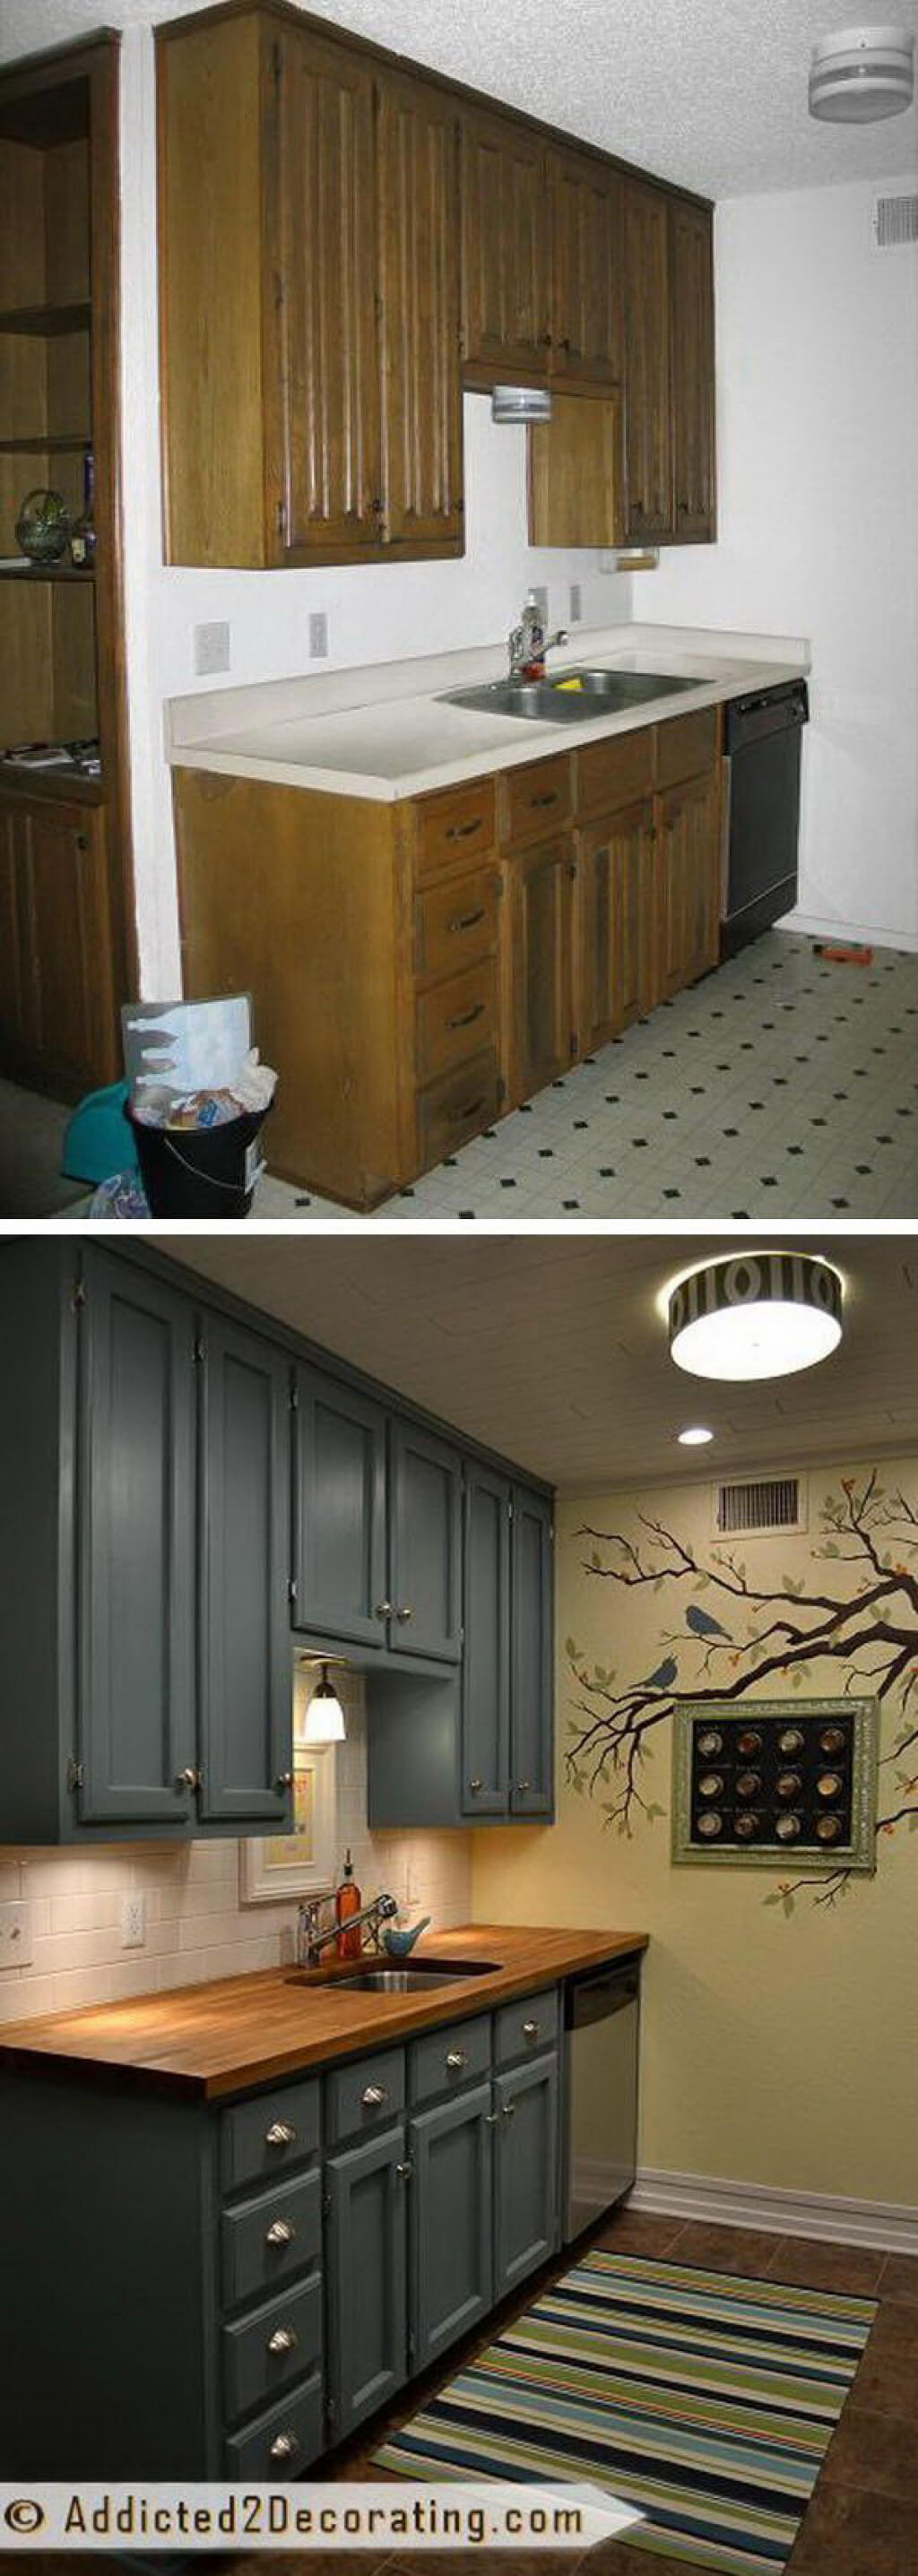 A Dark Vintage Design with Sandy Tiled Floors